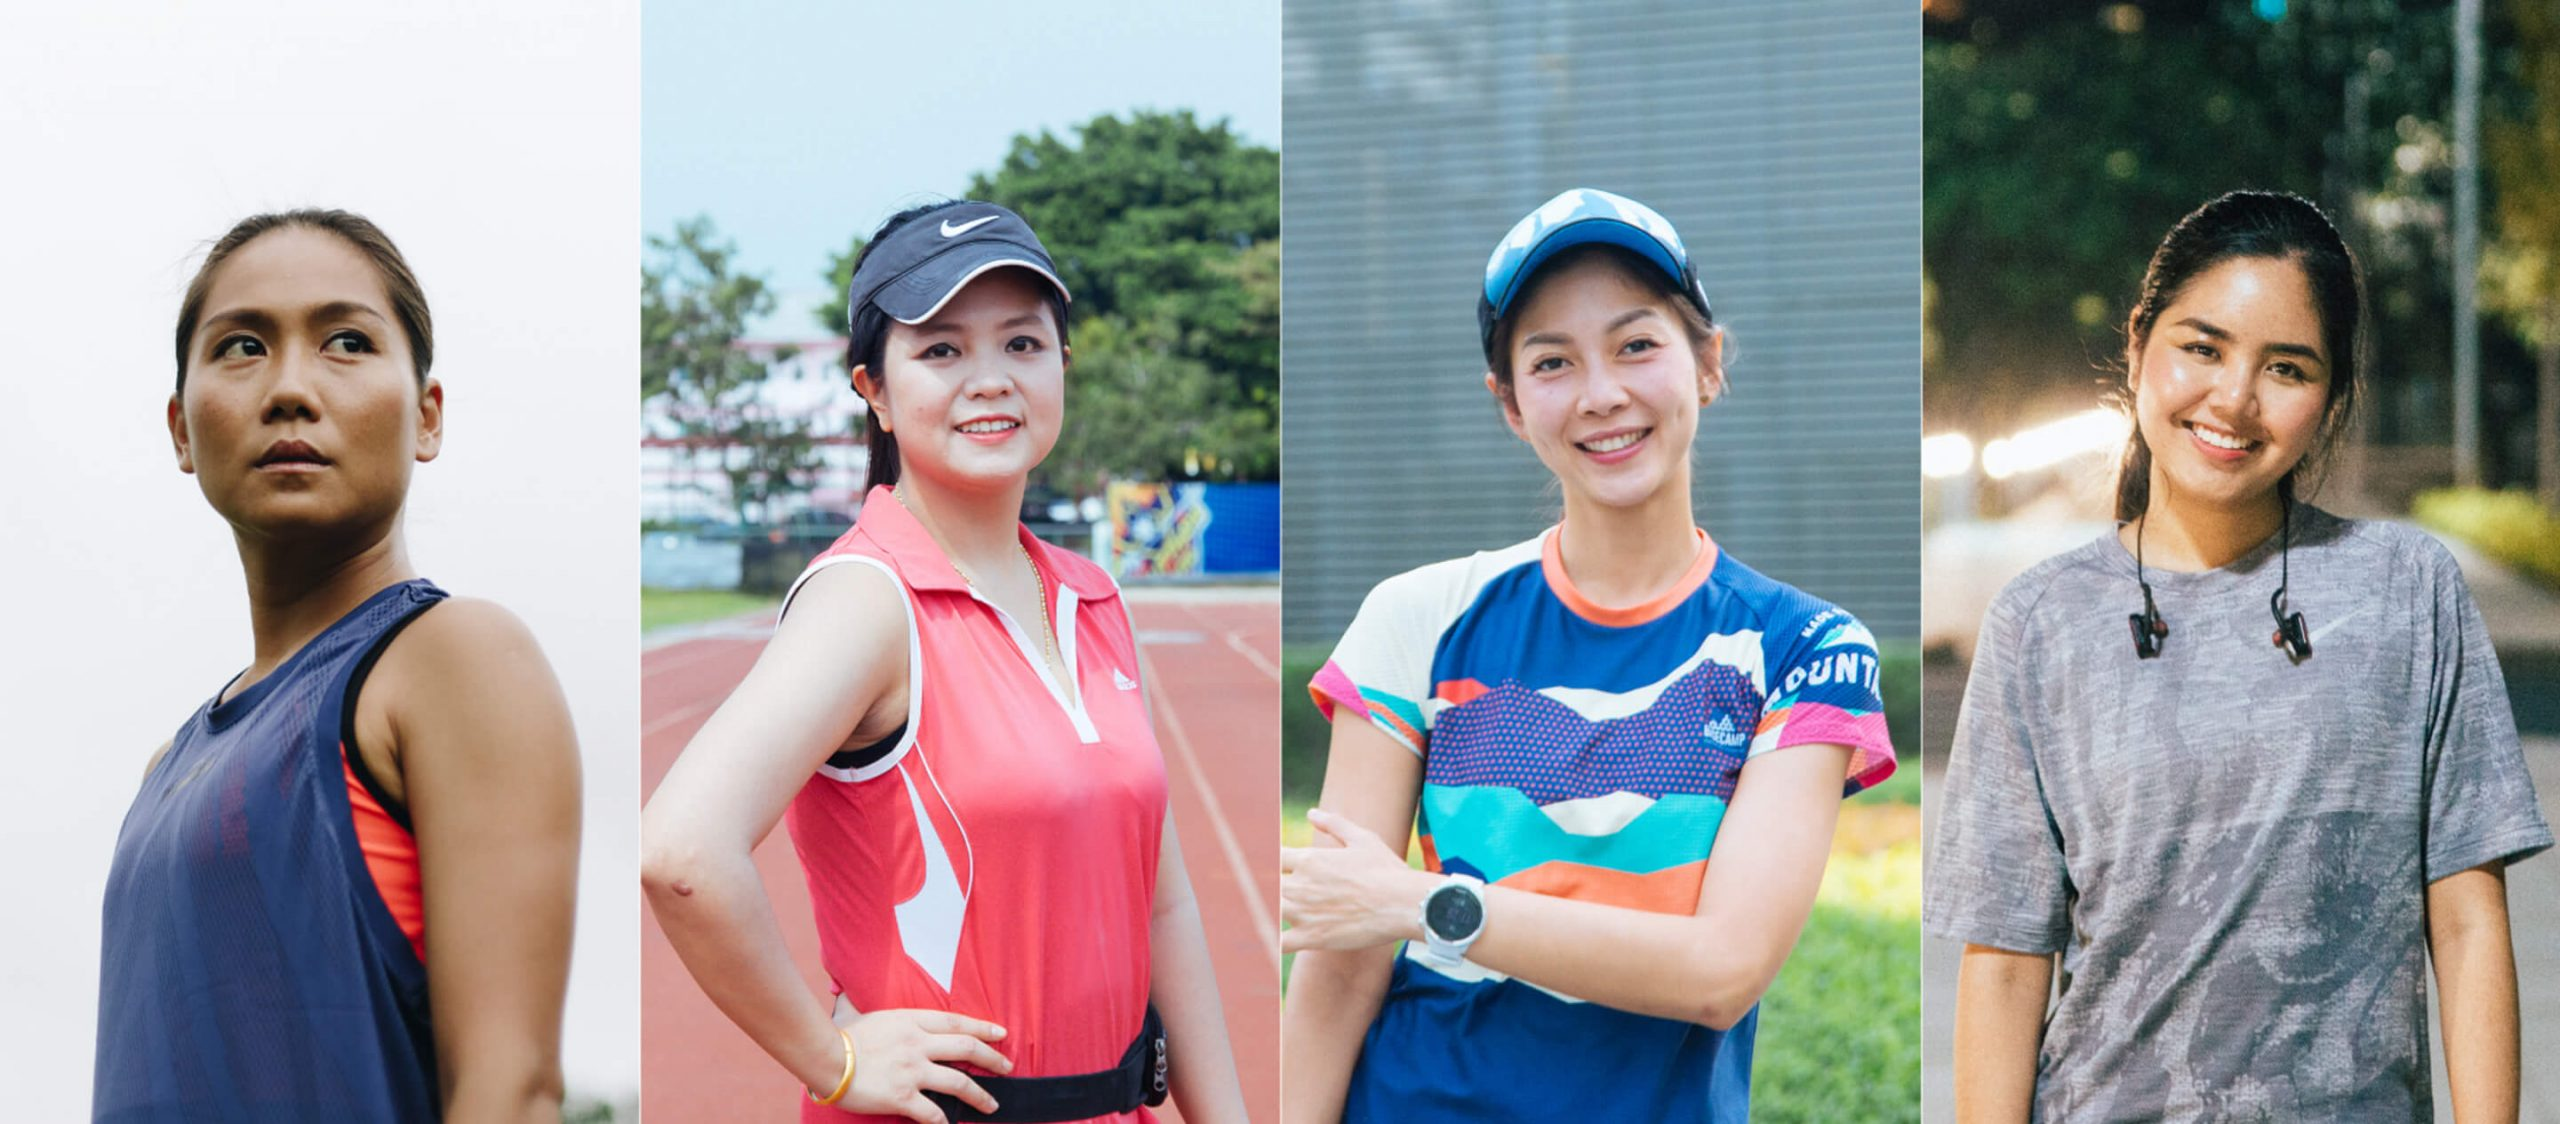 The Beauty of Running : ความงามและแรงบันดาลใจของผู้หญิงที่รักการวิ่ง